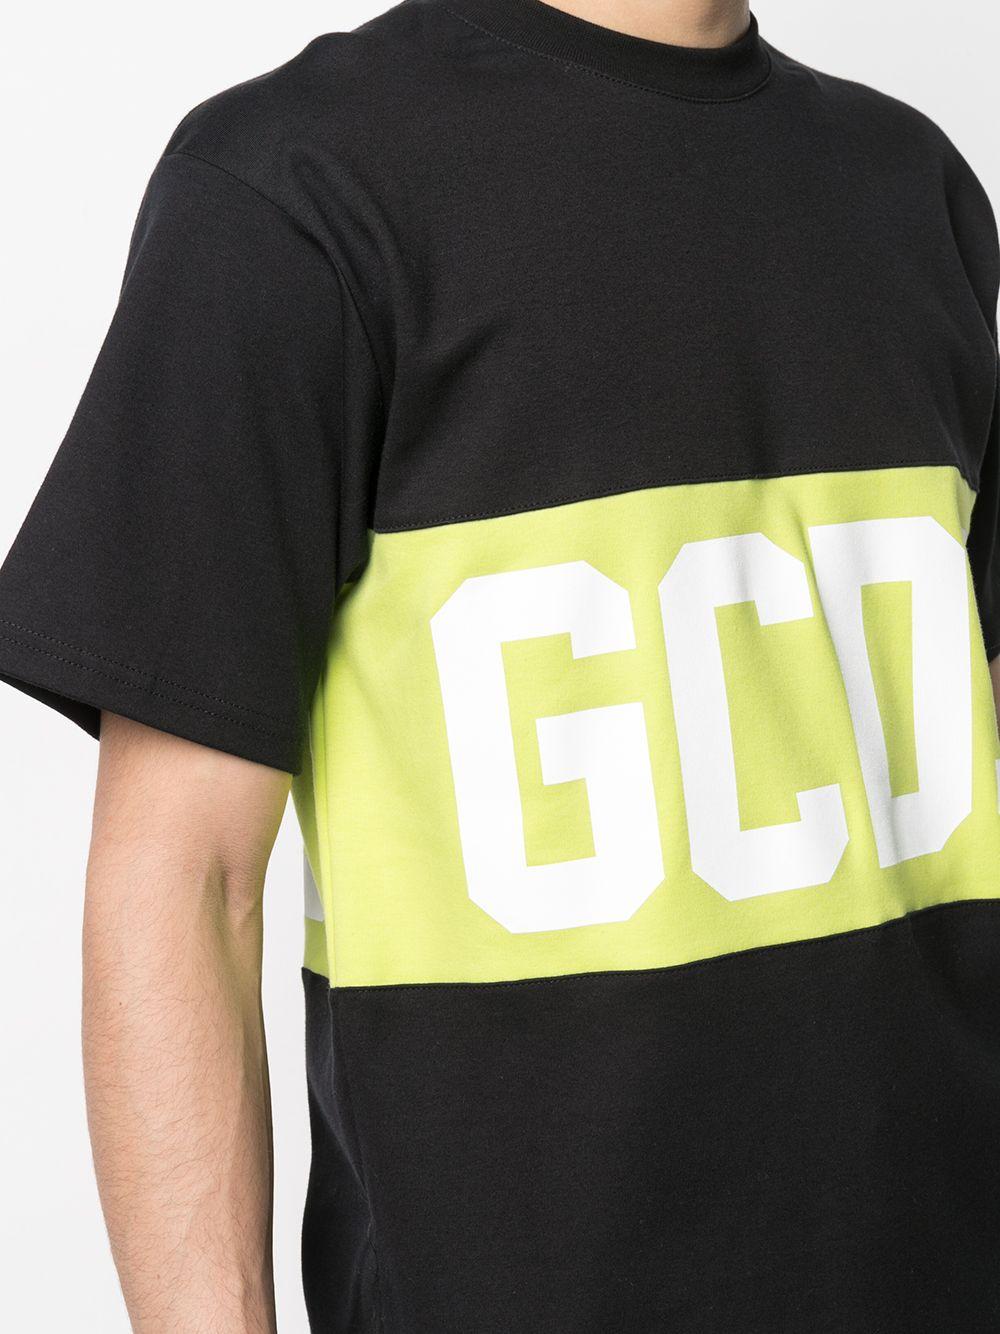 NEON LOGO TEE GCDS | T-shirts | CC94M021014MX